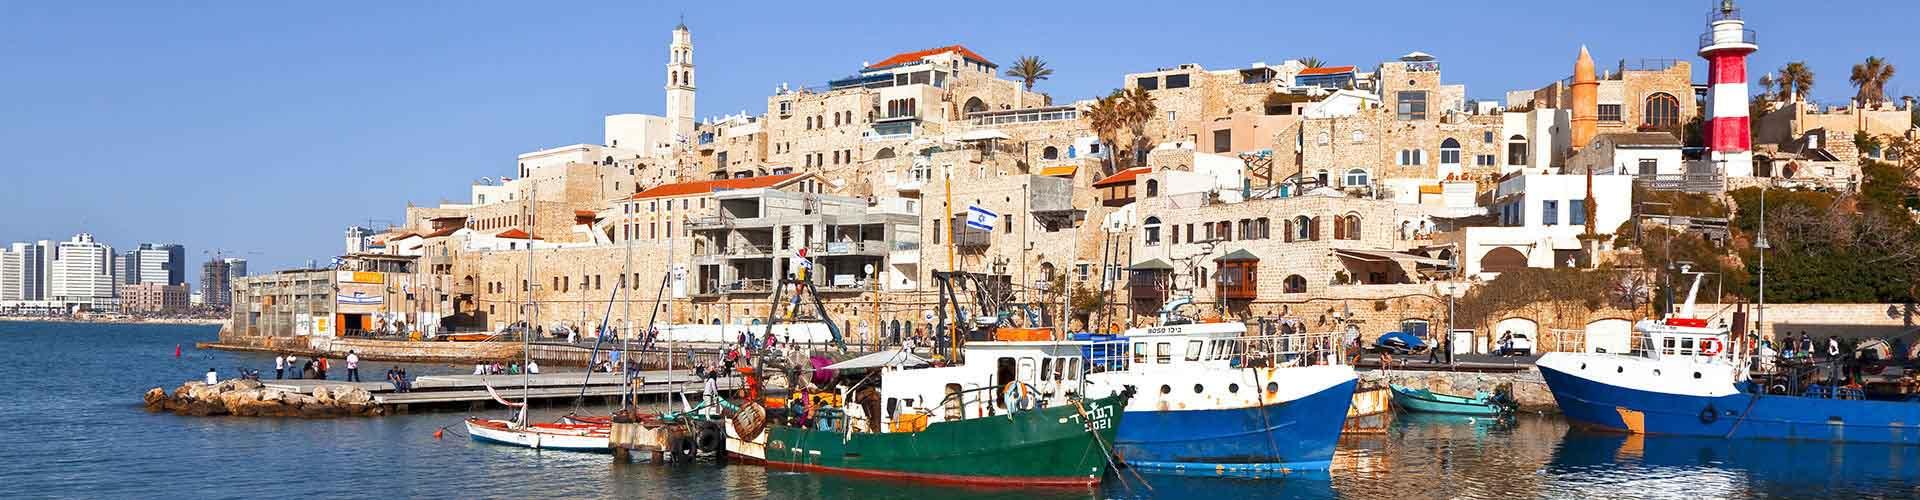 Tel Aviv – Ostelli a Tel Aviv. Mappe per Tel Aviv, Foto e  Recensioni per ogni Ostello a Tel Aviv.